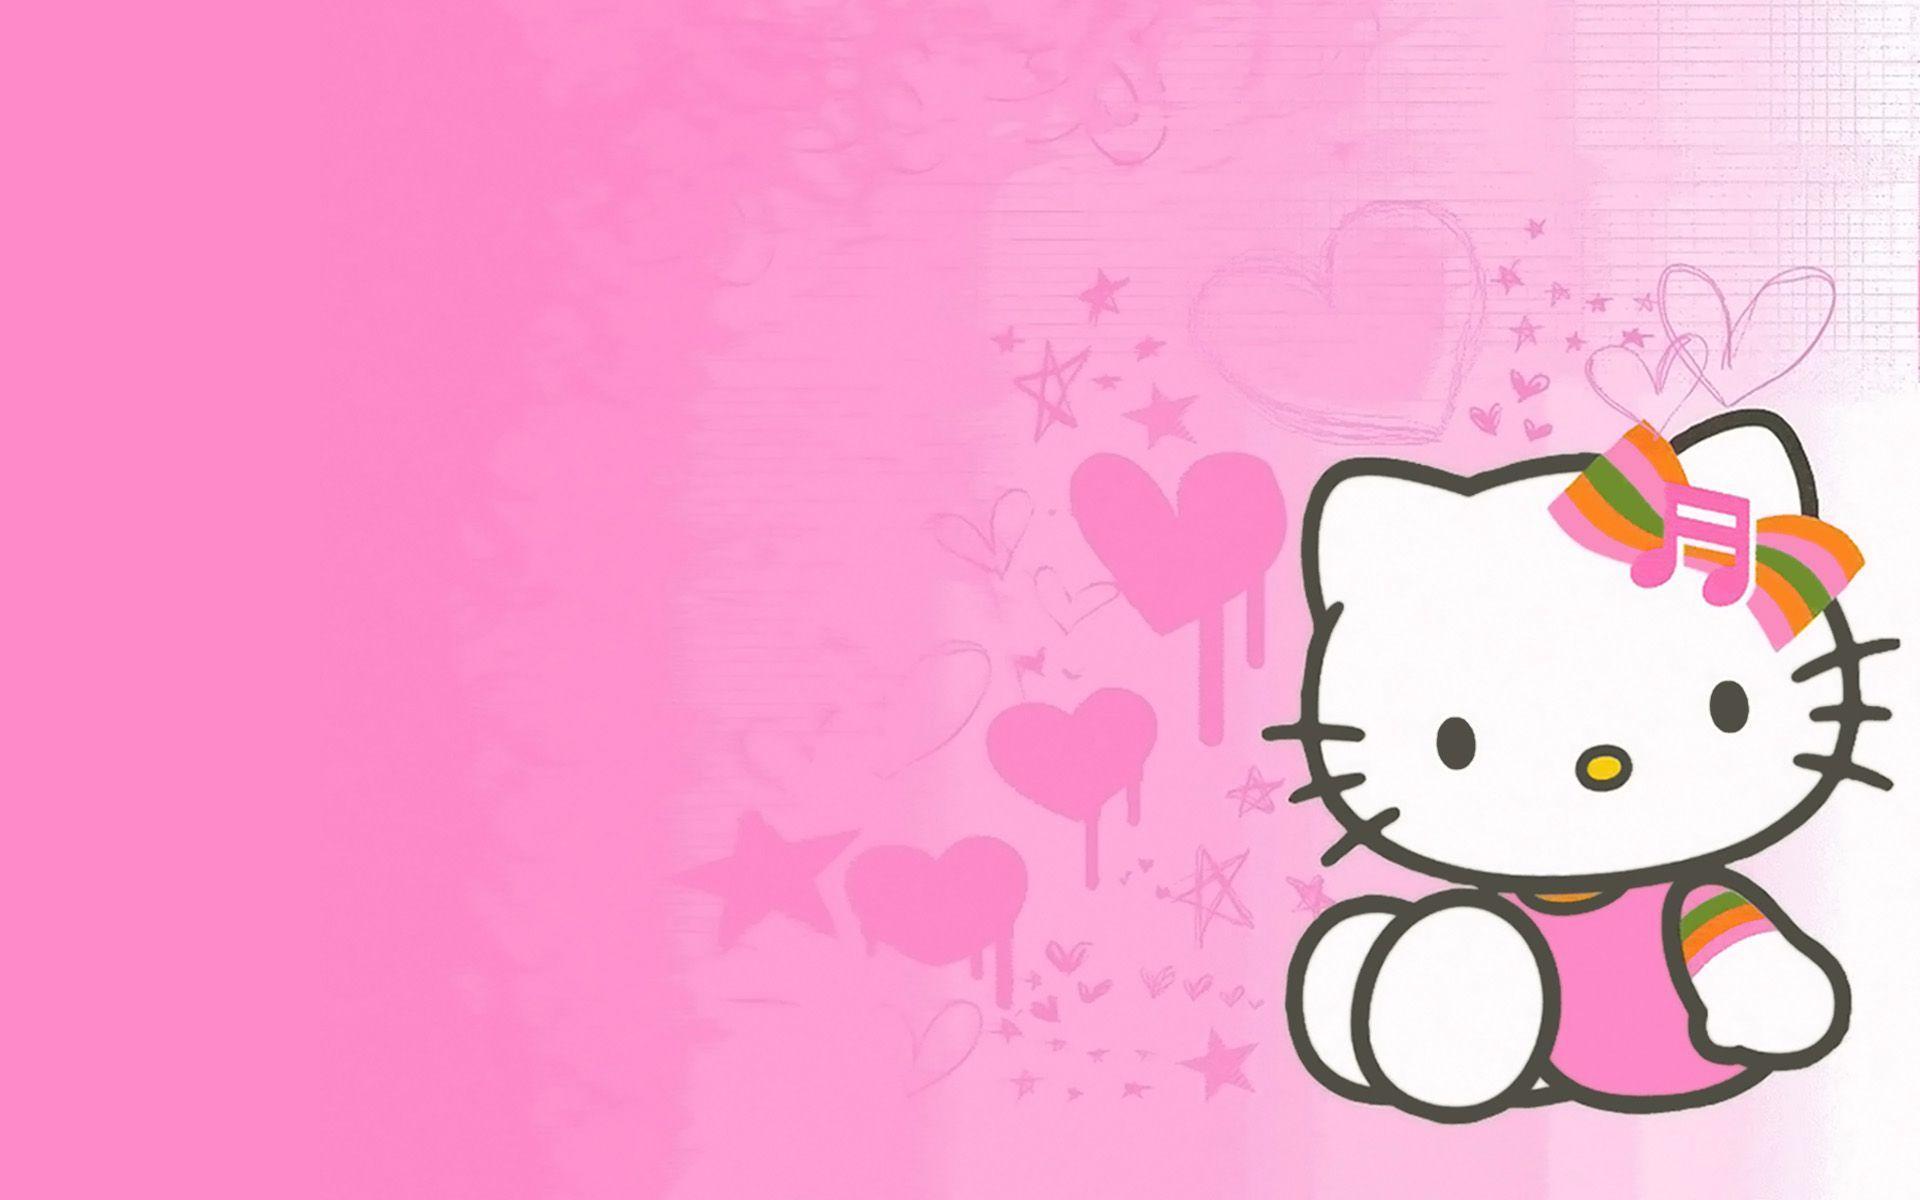 Cute Pink Cartoon Wallpapers Top Free Cute Pink Cartoon Backgrounds Wallpaperaccess